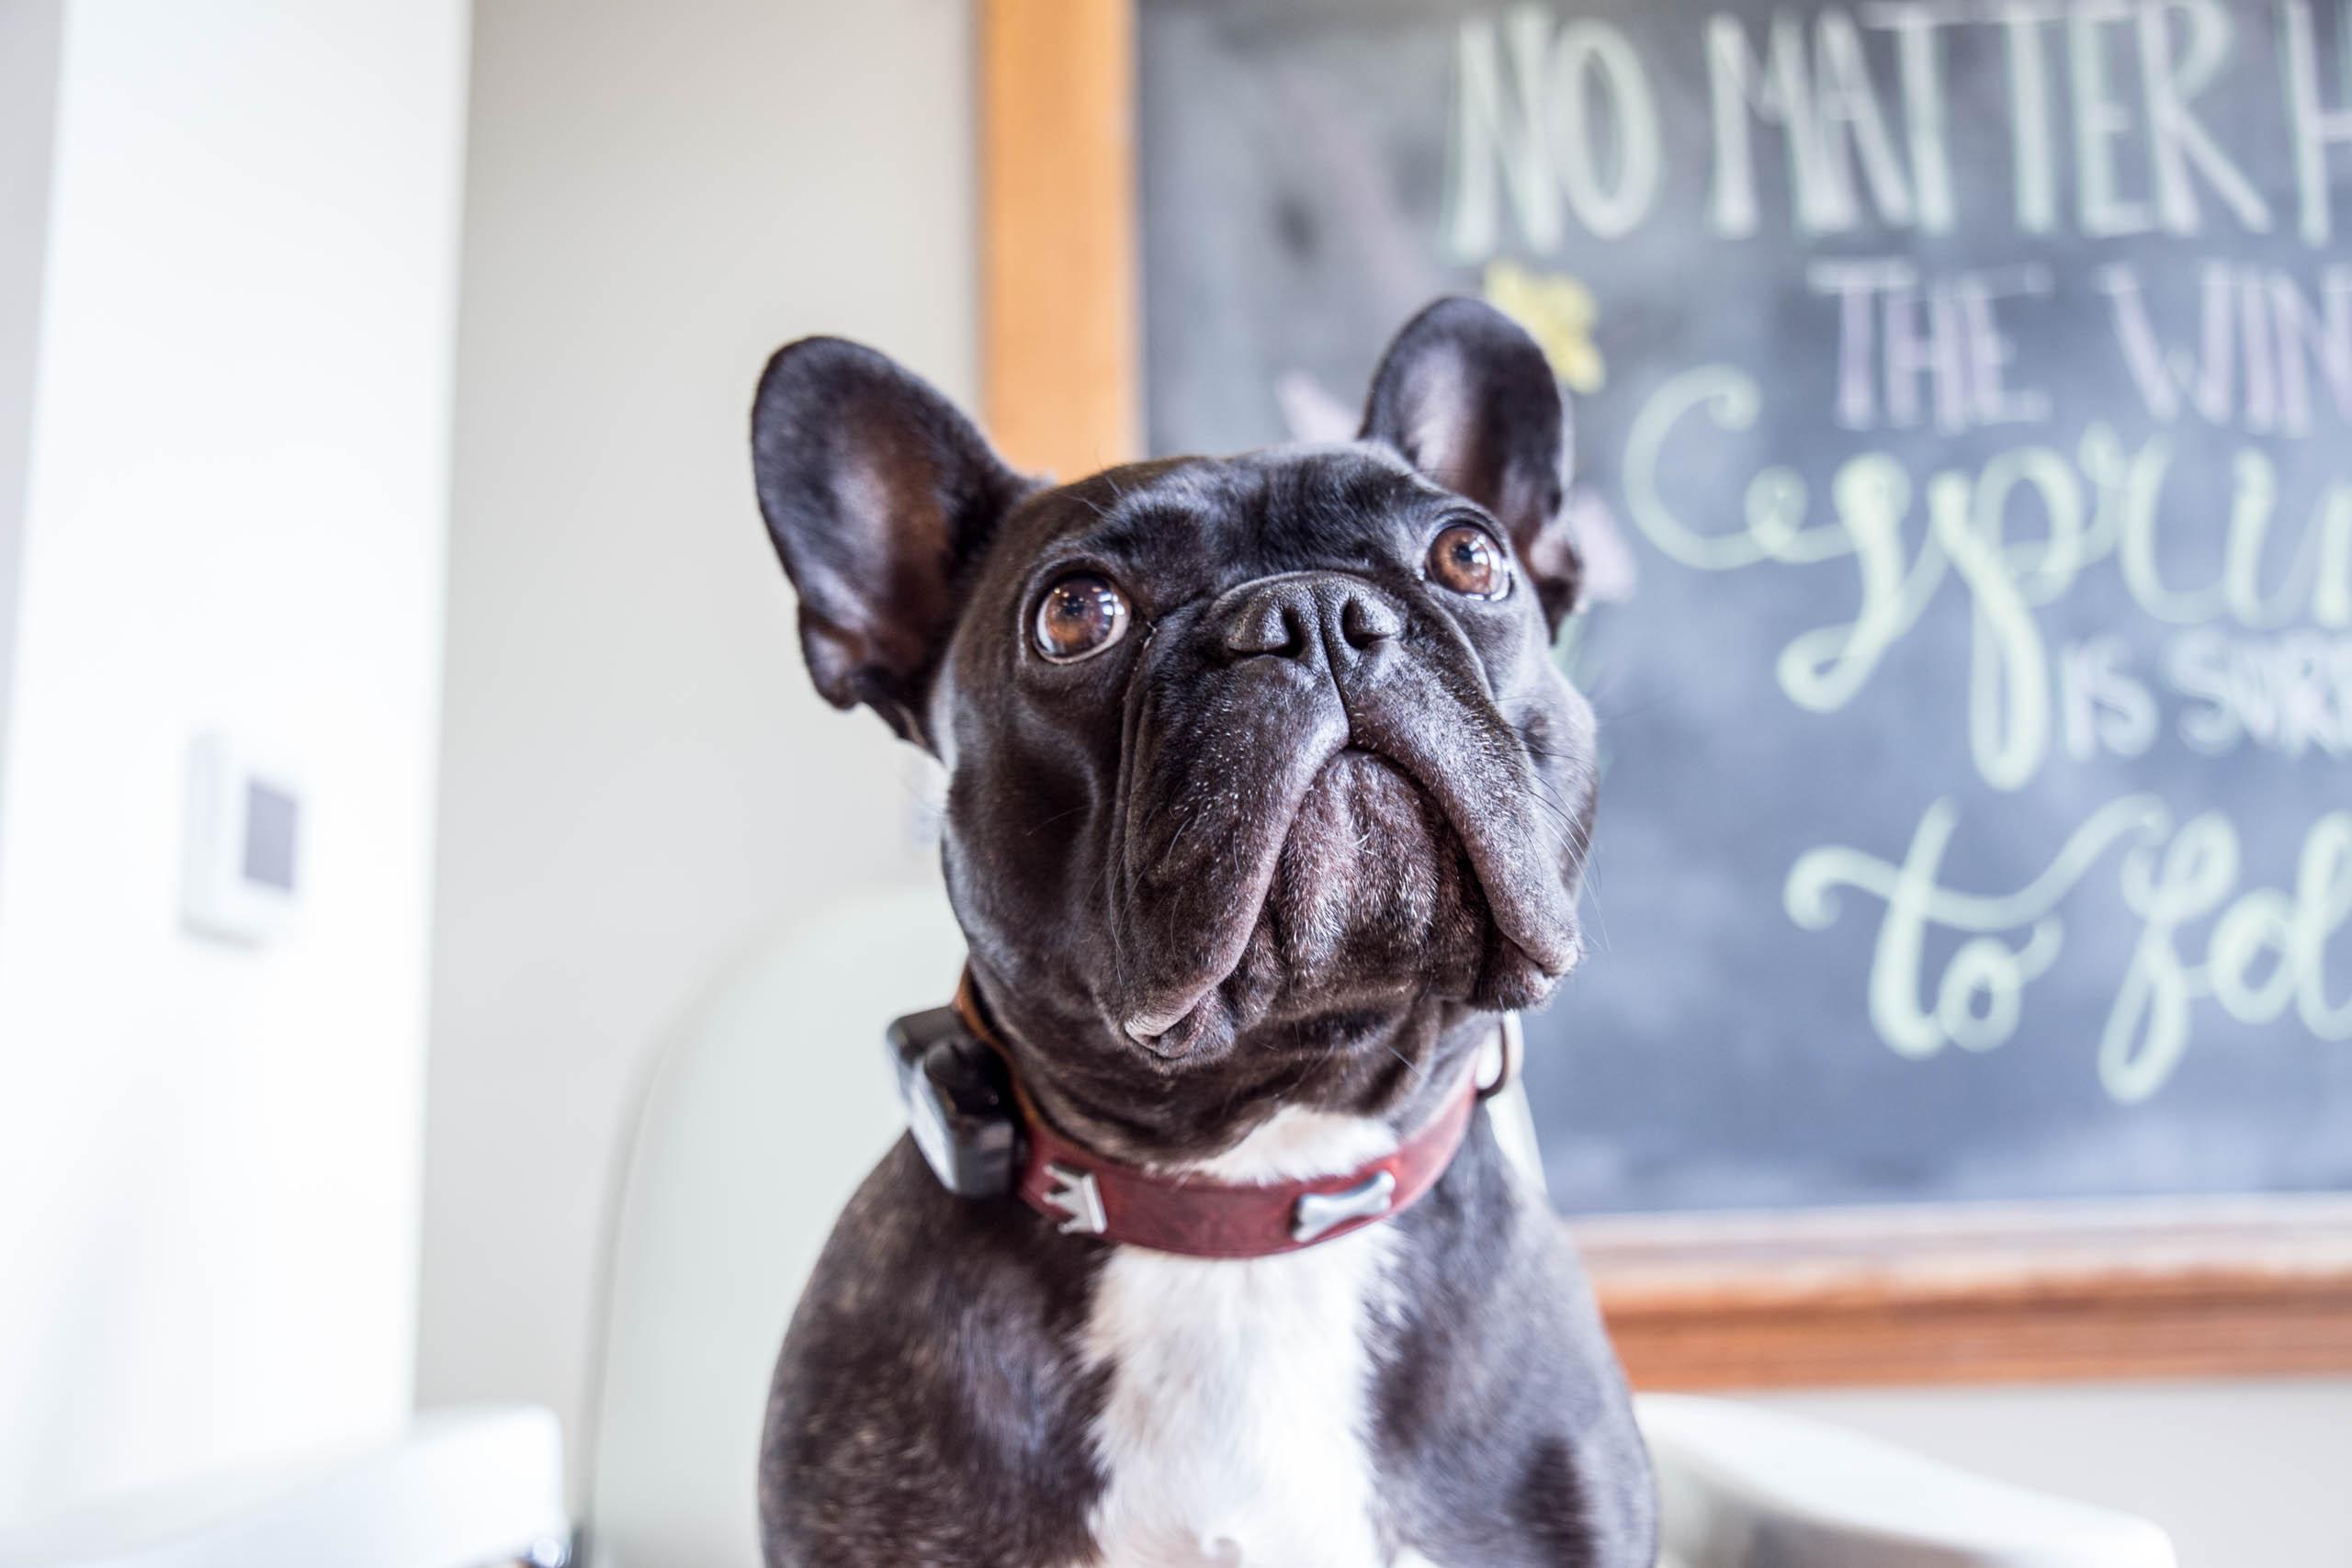 Photograph of Boudreau, Office Dog